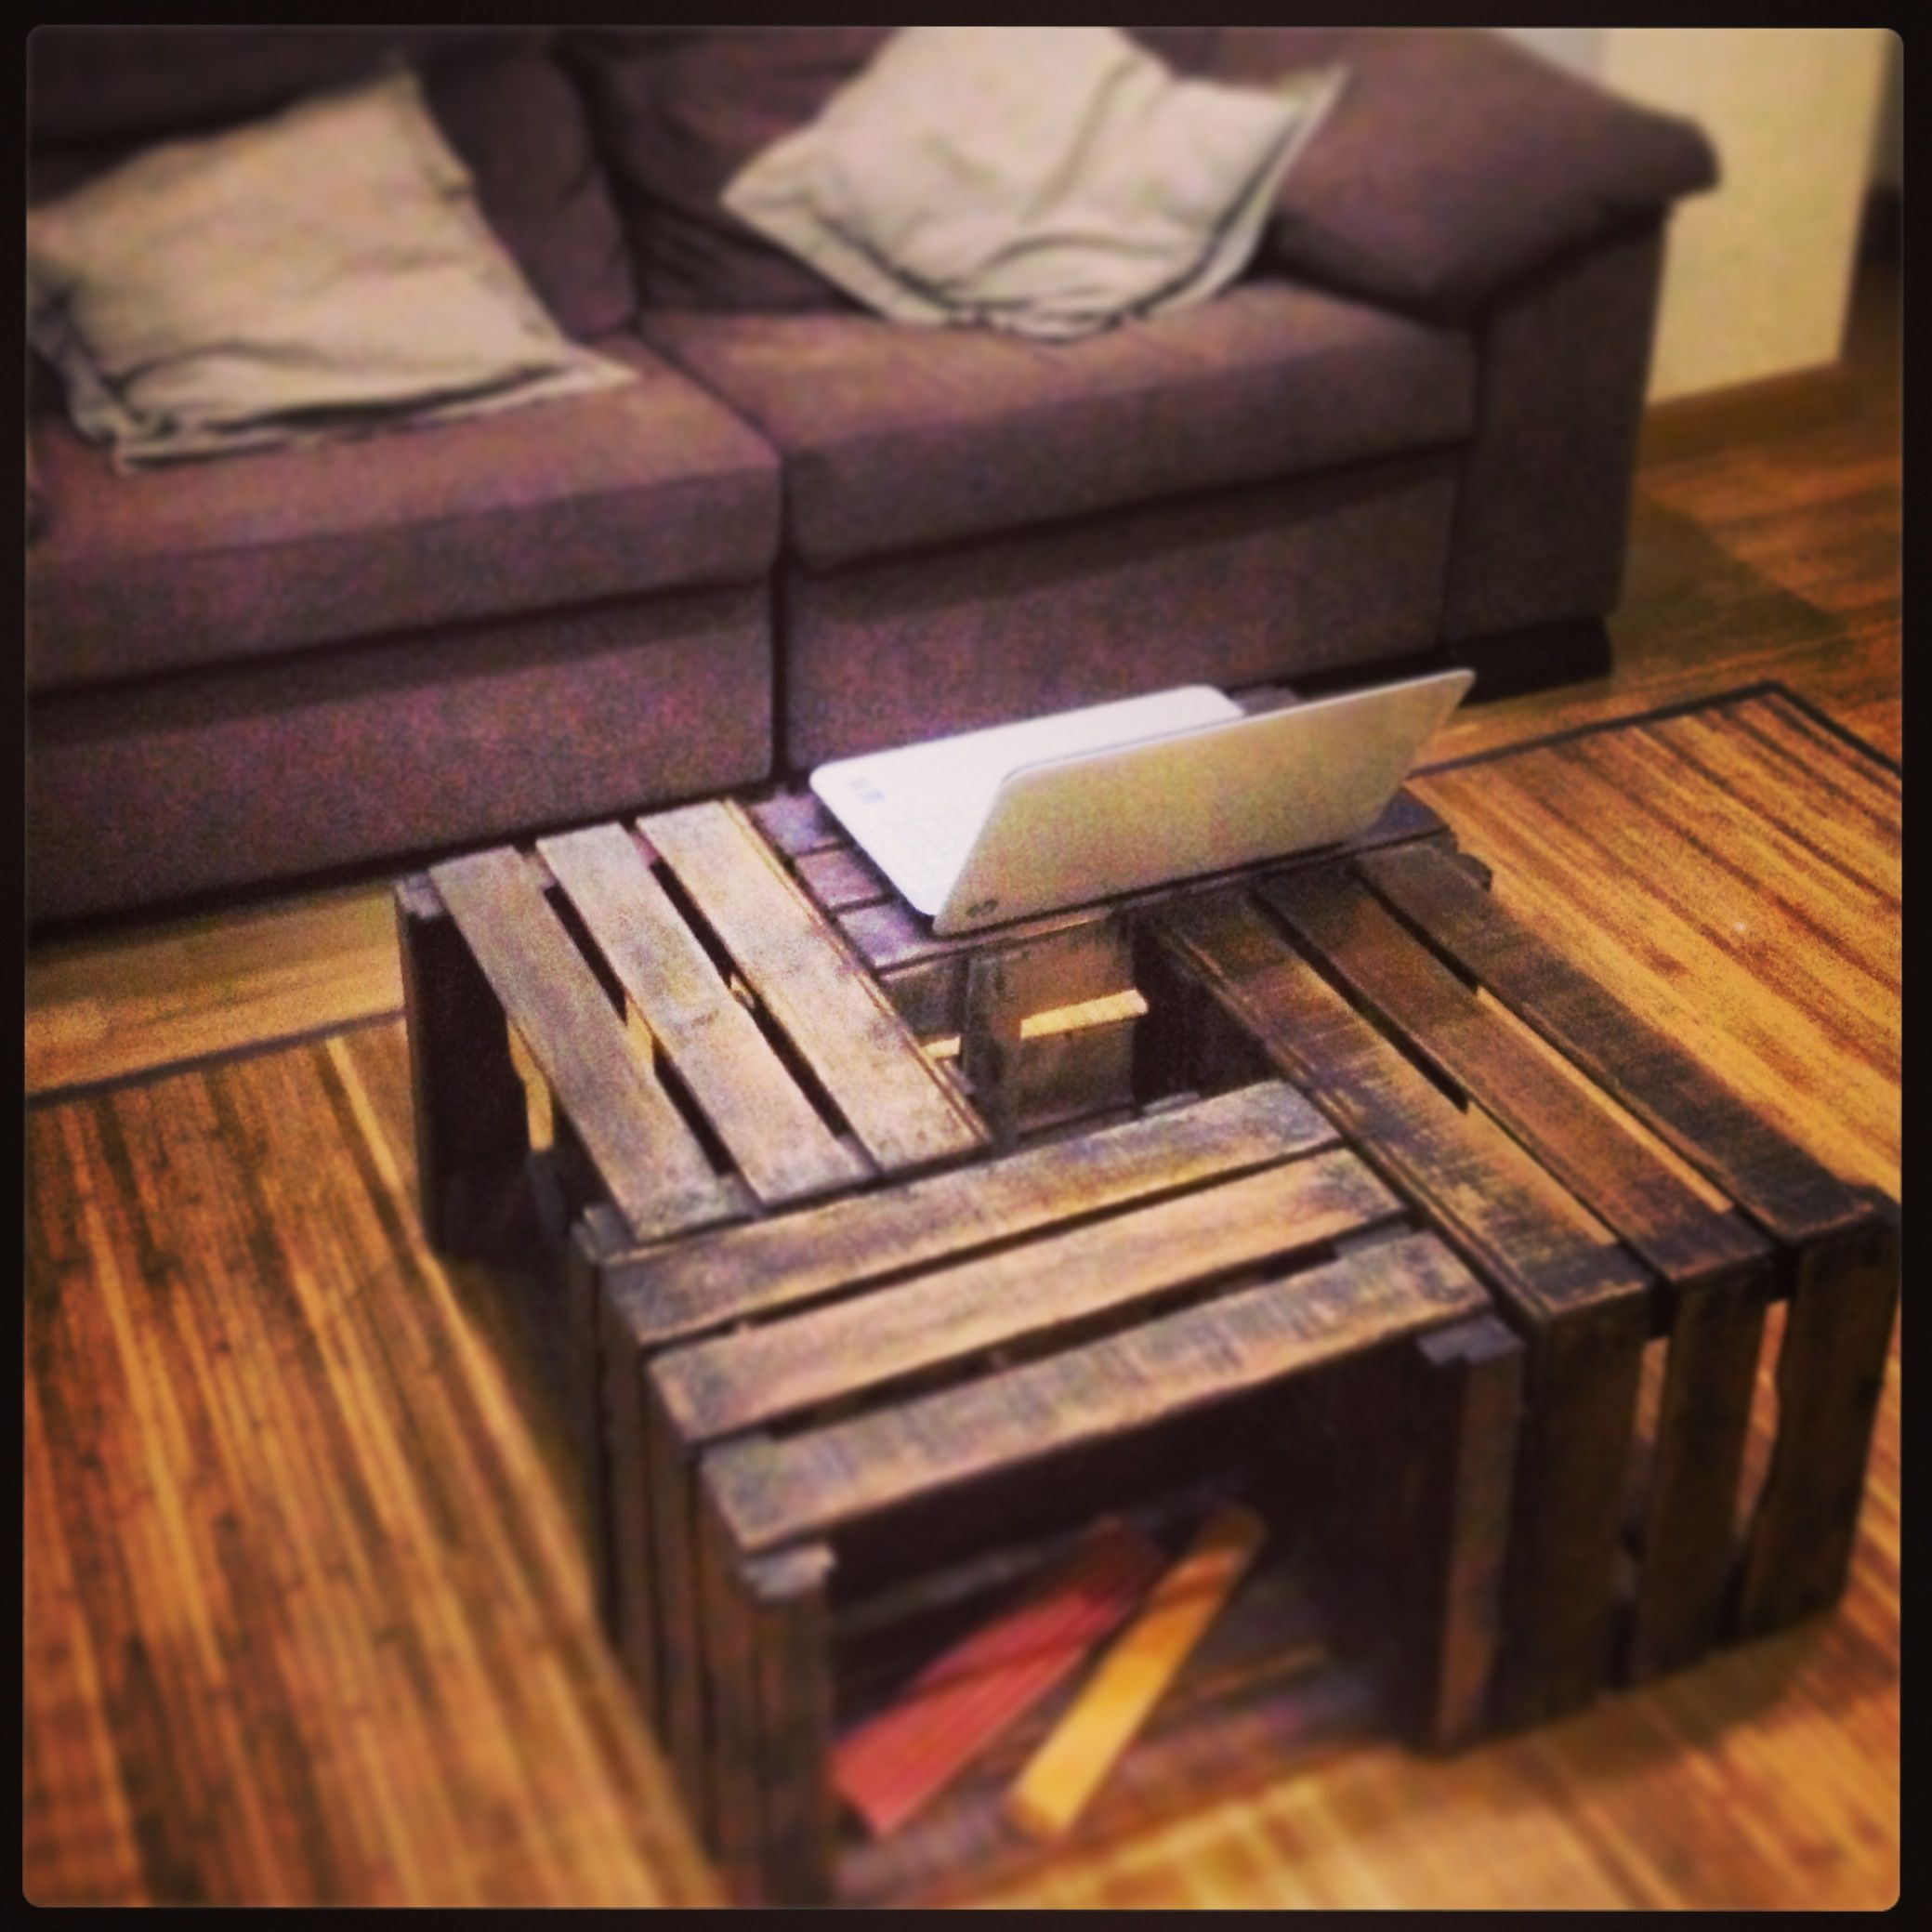 Cajas fruta madera mesa reciclada ideas para reusar pinterest wooden furniture ideas para - Cajas de madera para frutas ...